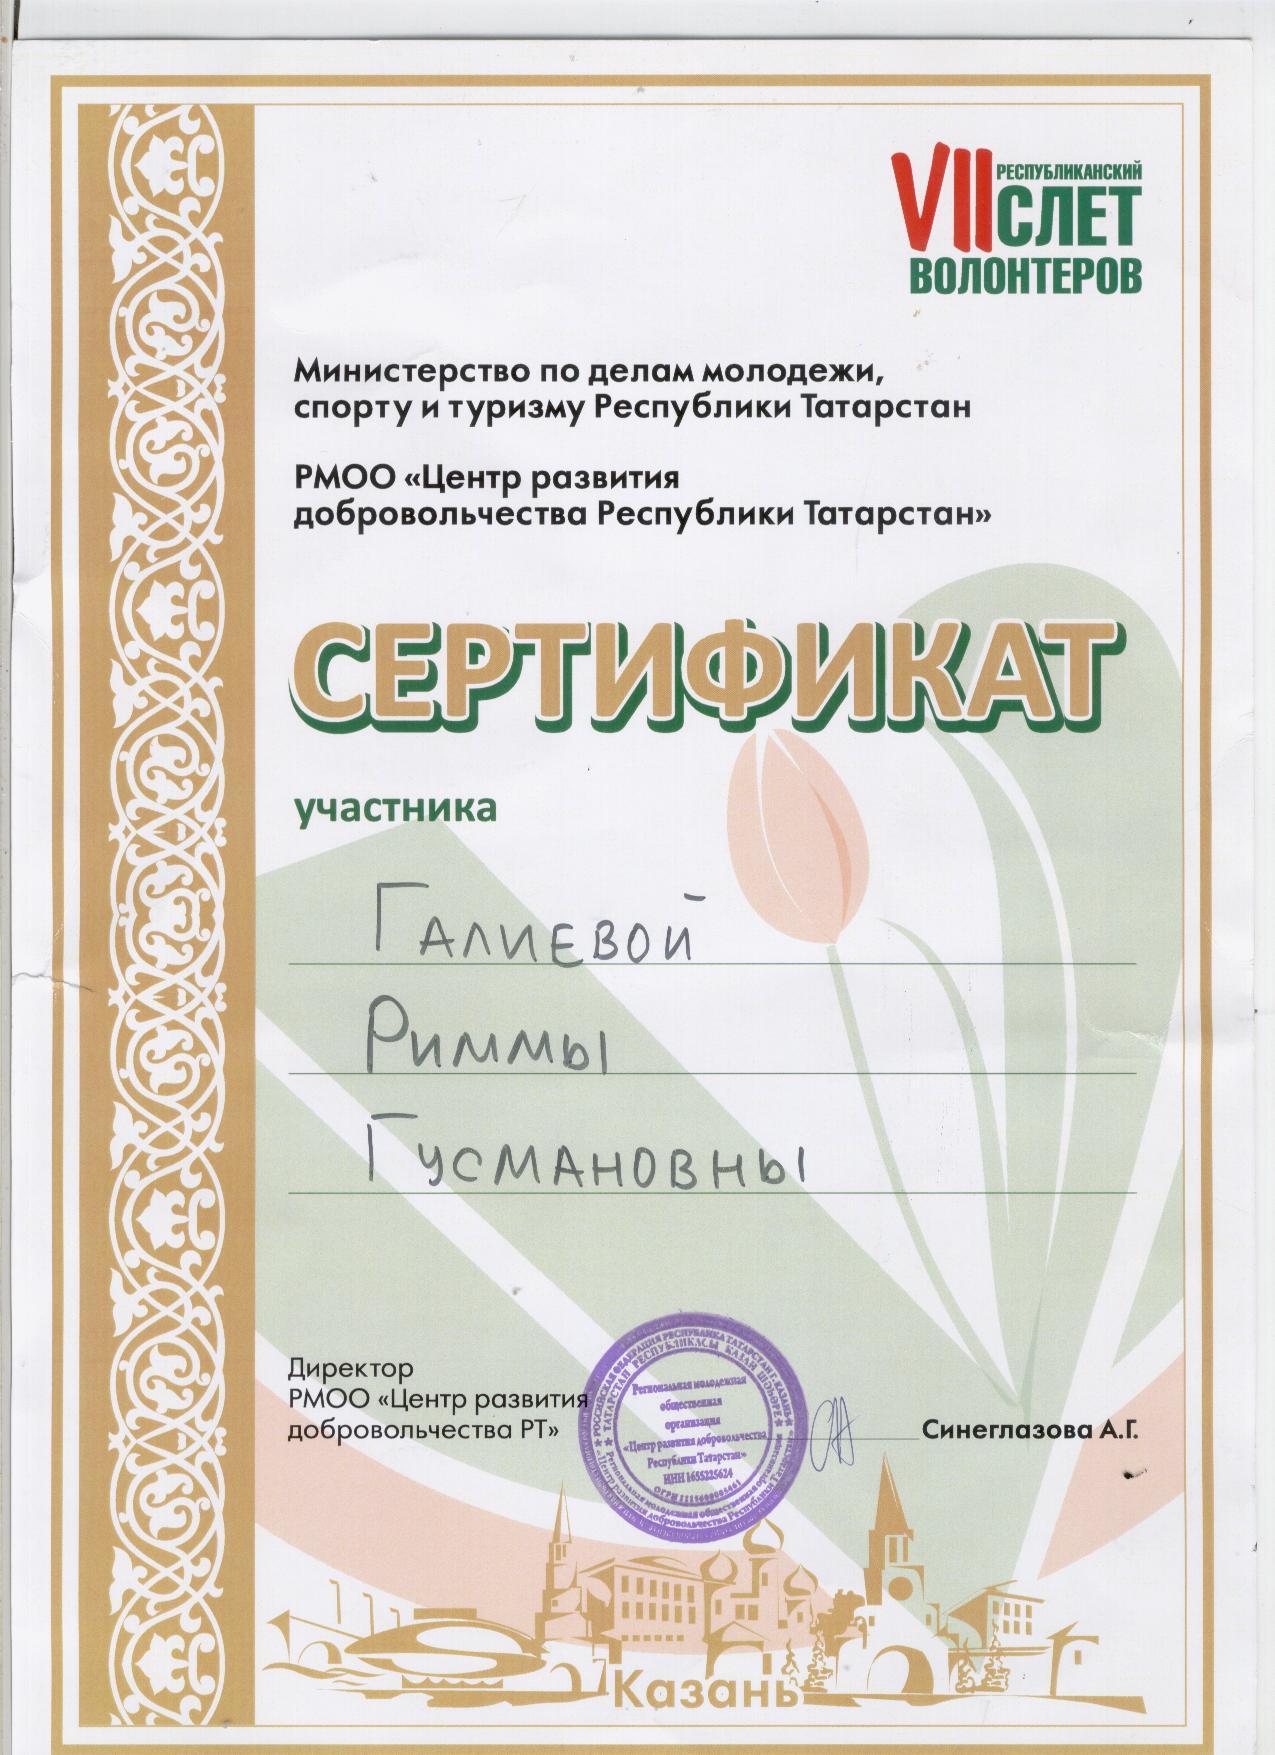 F:\Всероссйский конкурс Портфолио выпускника\РИММА\Римма 001.jpg